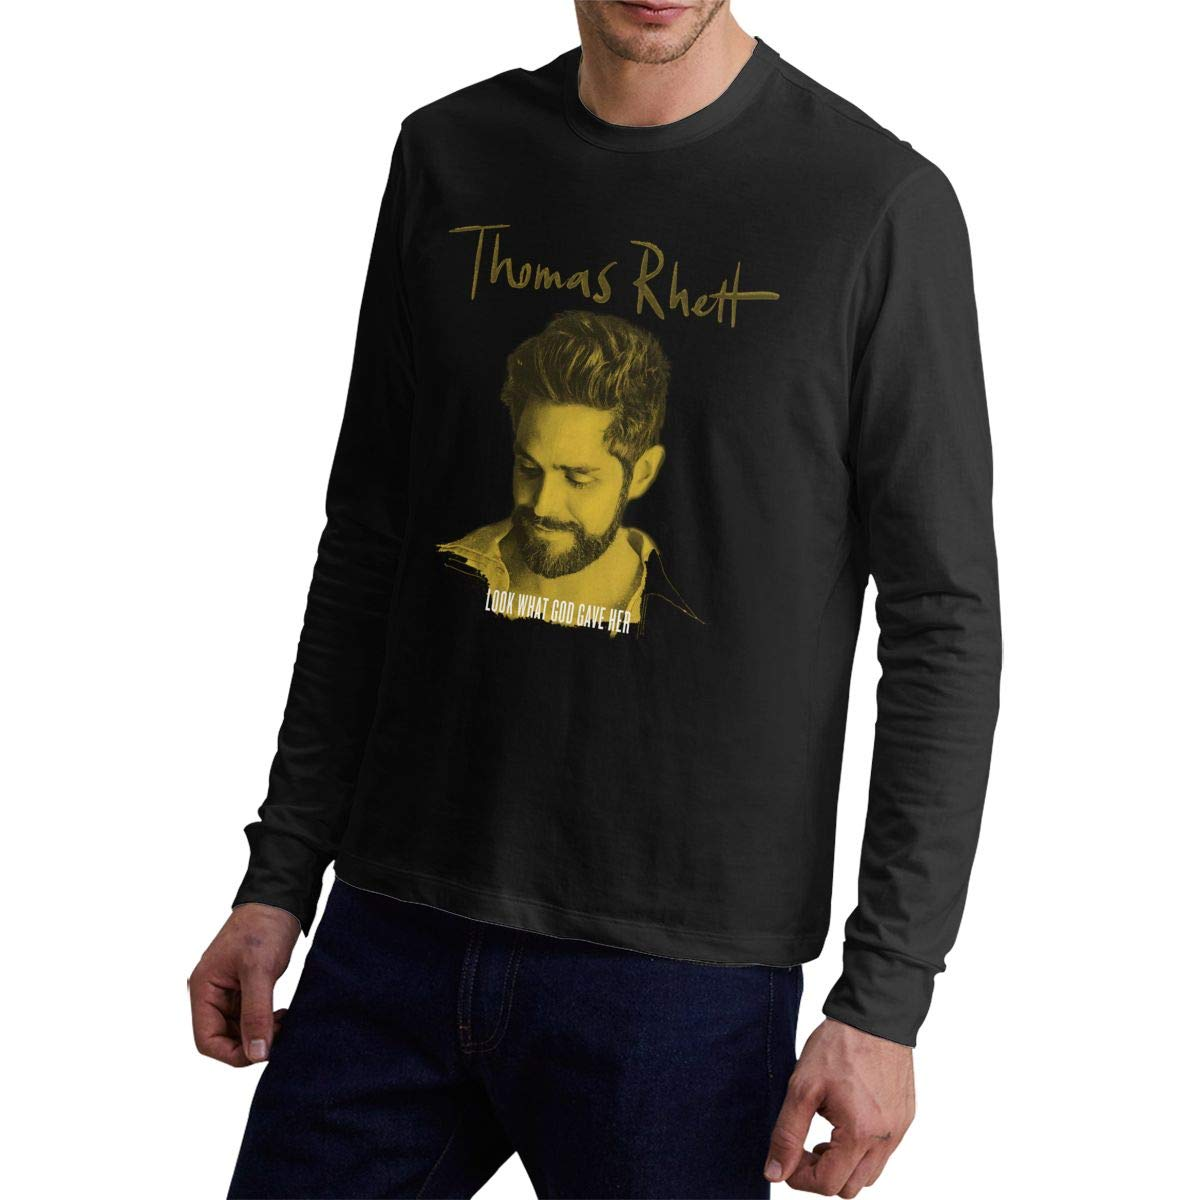 Man Long-sleeve Shirt Thomas Rhett Art Graphics Funny Tops Black